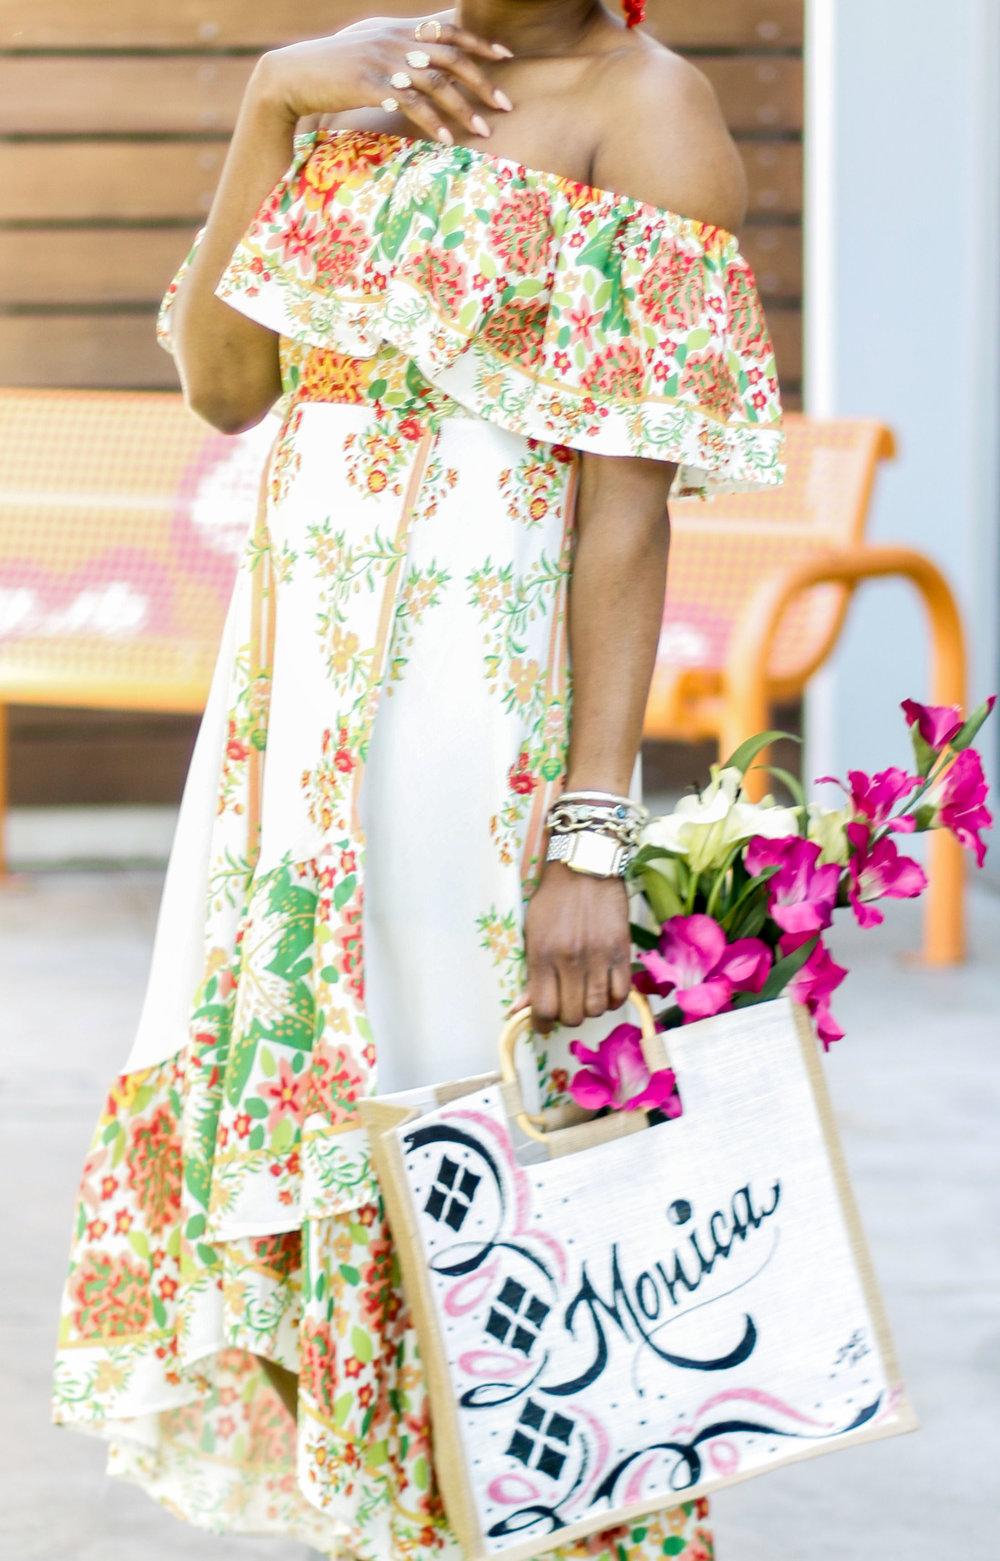 FASHION BLOGGER WEARING A FLORAL DRESS.jpg